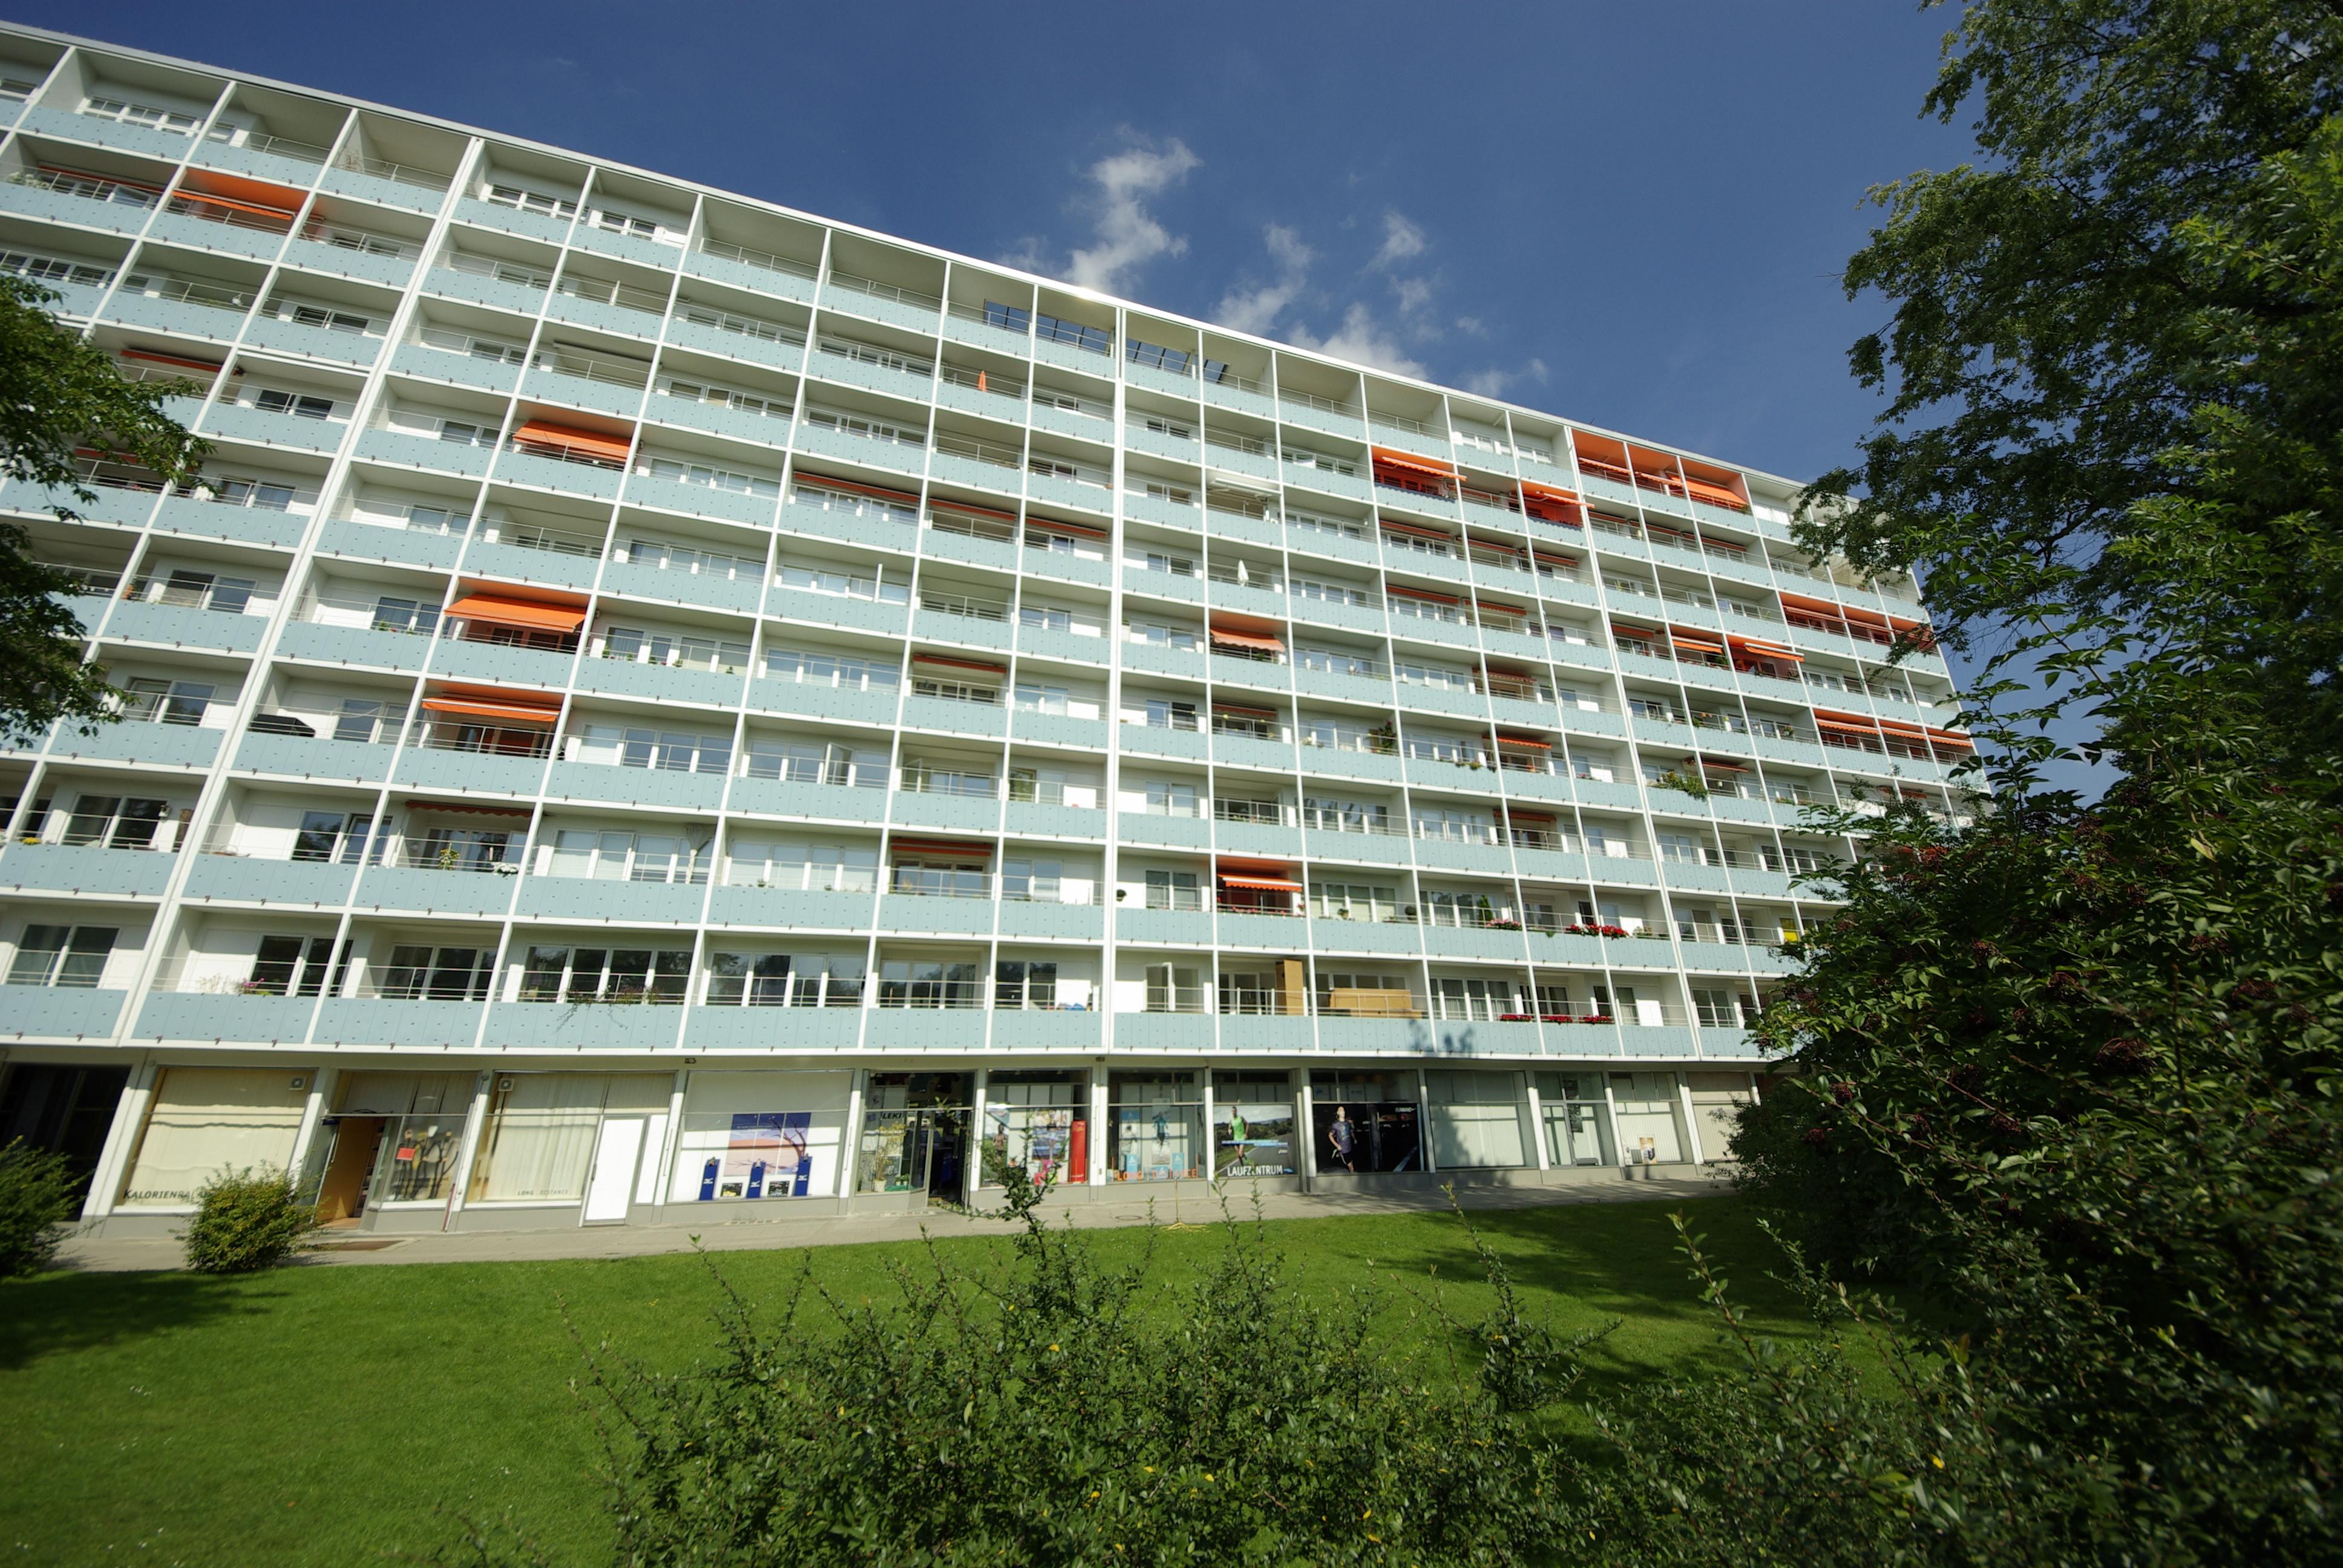 Schwedenhaus Berlin file berlin hansaviertel schwedenhaus 002 jpg wikimedia commons